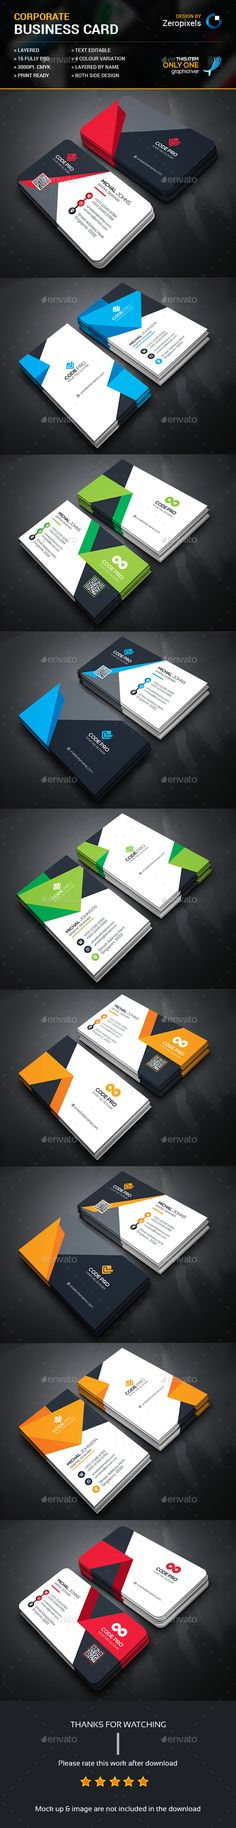 Corporate Business Card Bundle Templates PSD. Download here: http://graphicriver.net/item/corporate-business-card-bundle/16343673?ref=ksioks